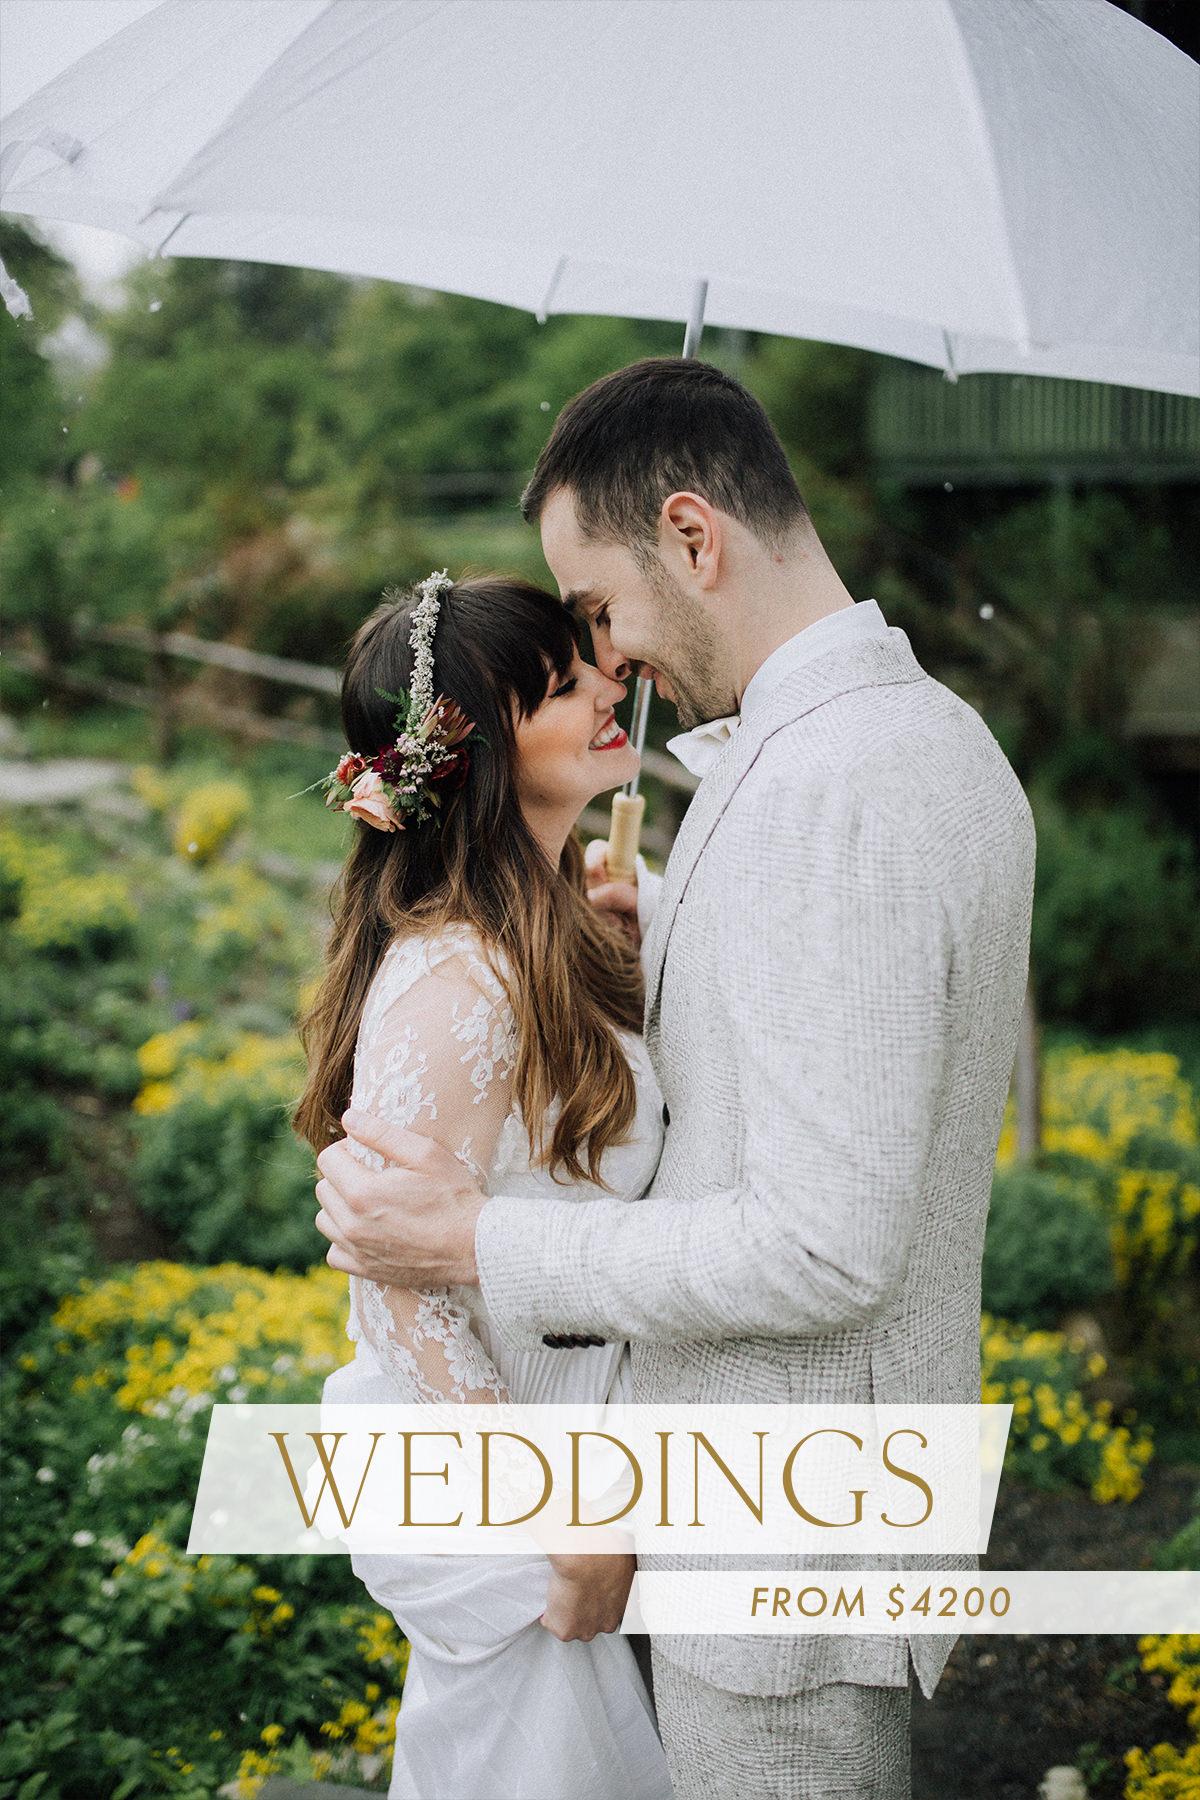 Los Angeles Wedding Photographer, Palm Springs Wedding Photographer, Southern California Wedding Photographer, LA wedding Photography, OC wedding Photographer, San Diego Wedding Photographer